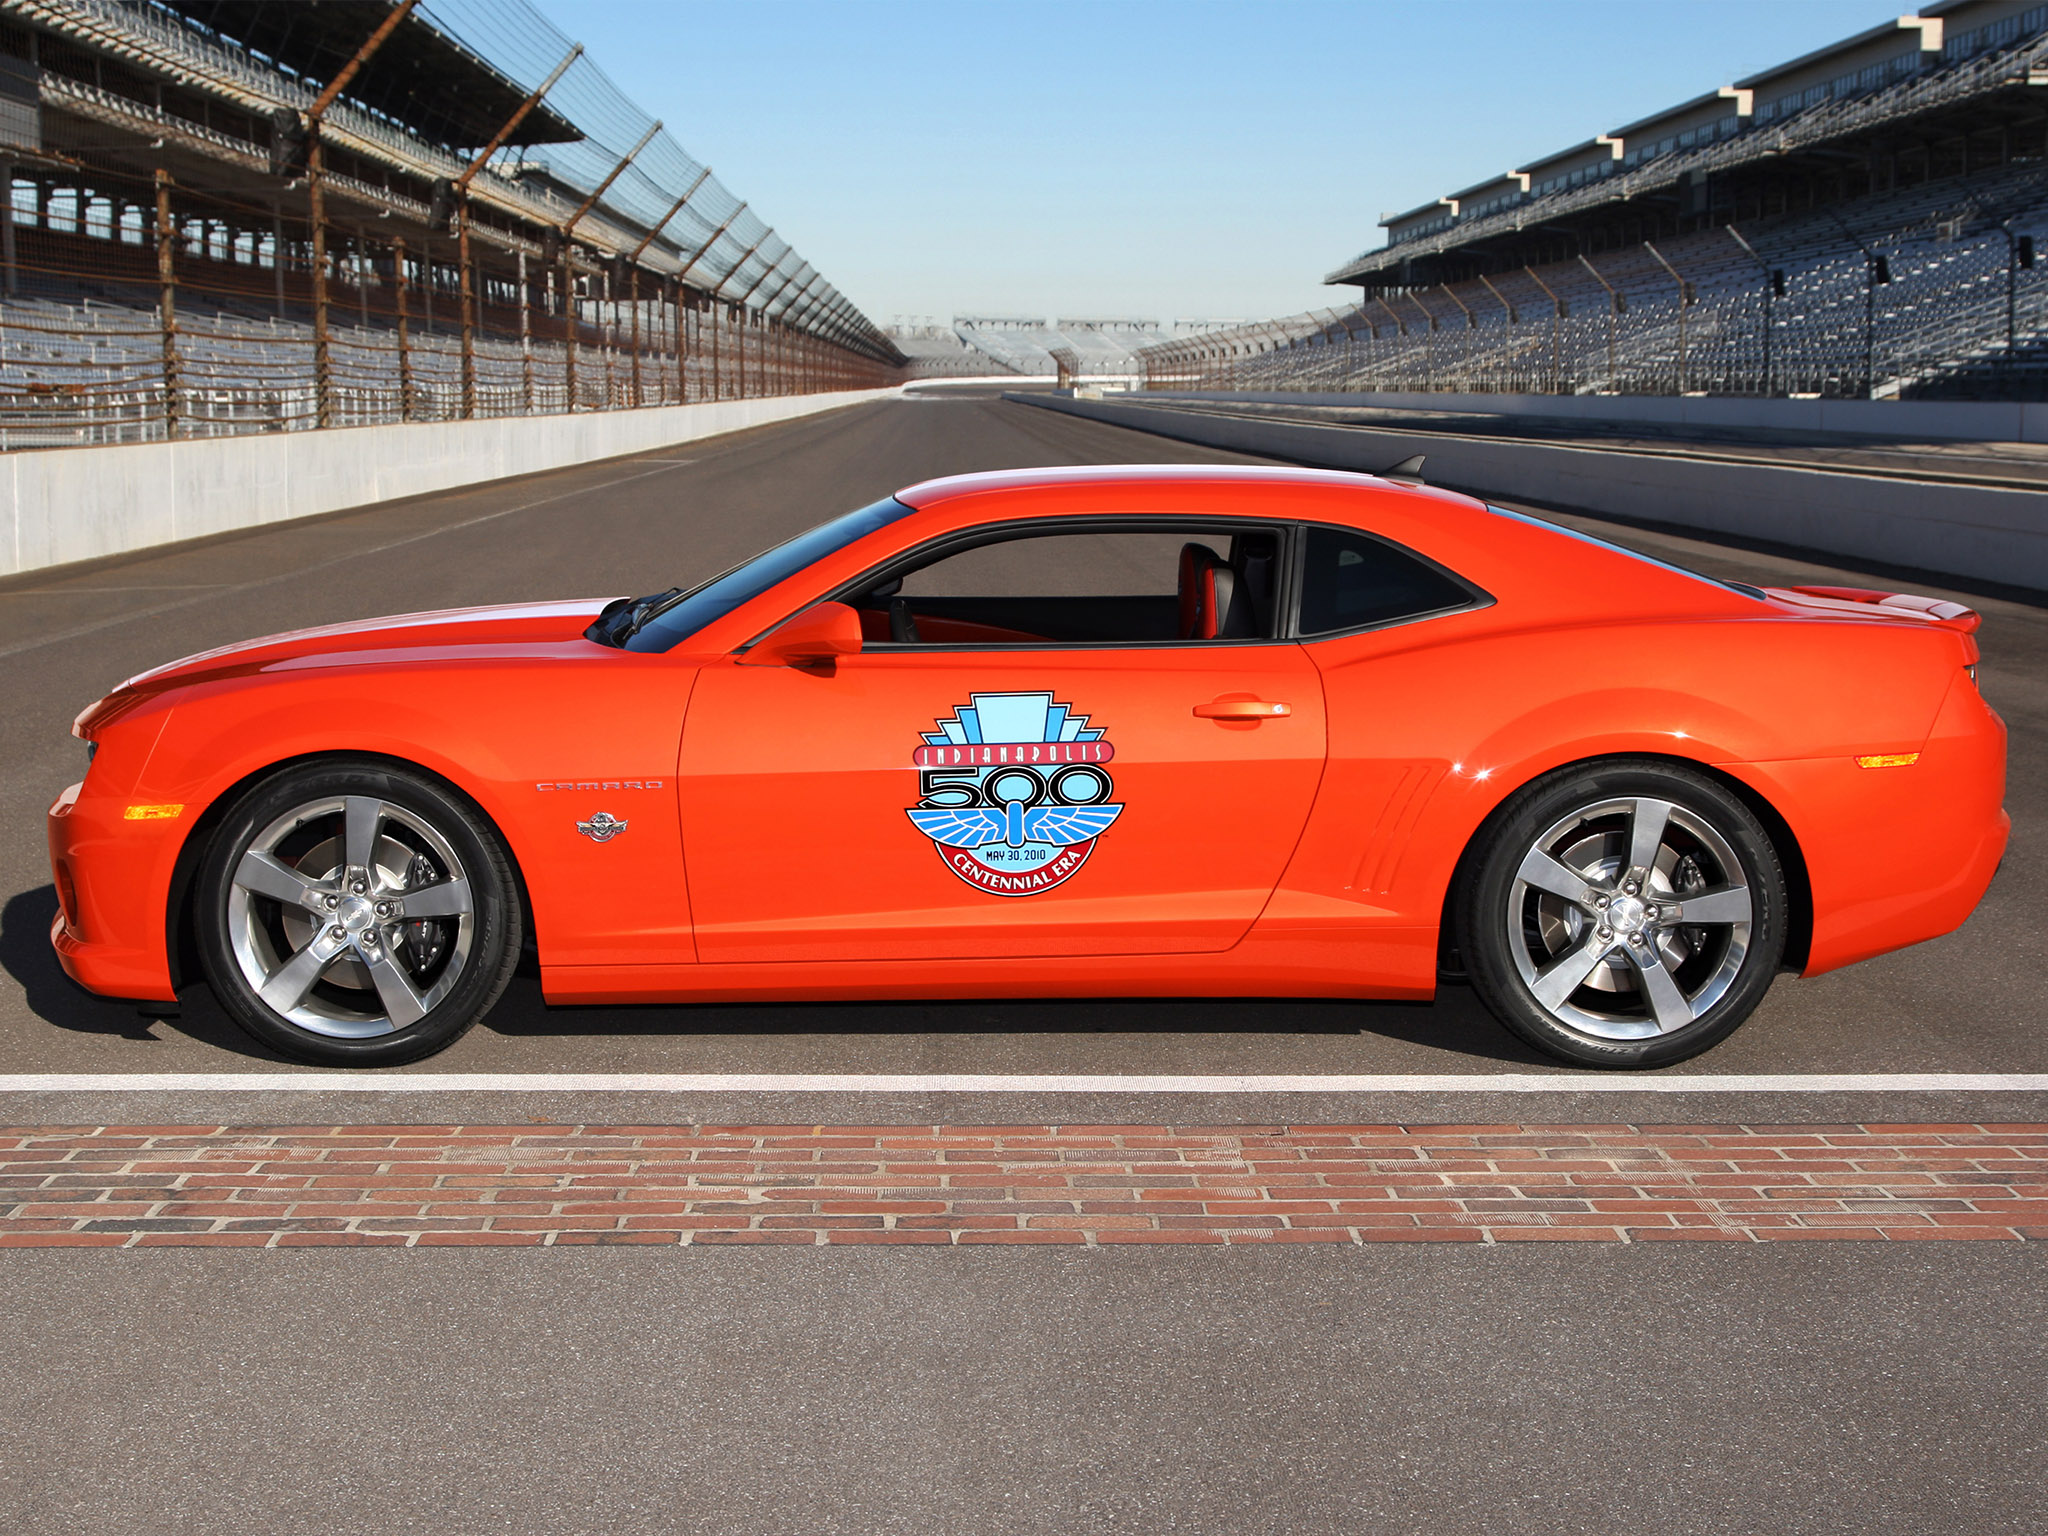 Camaro Indianapolis 500 - 2048x1536